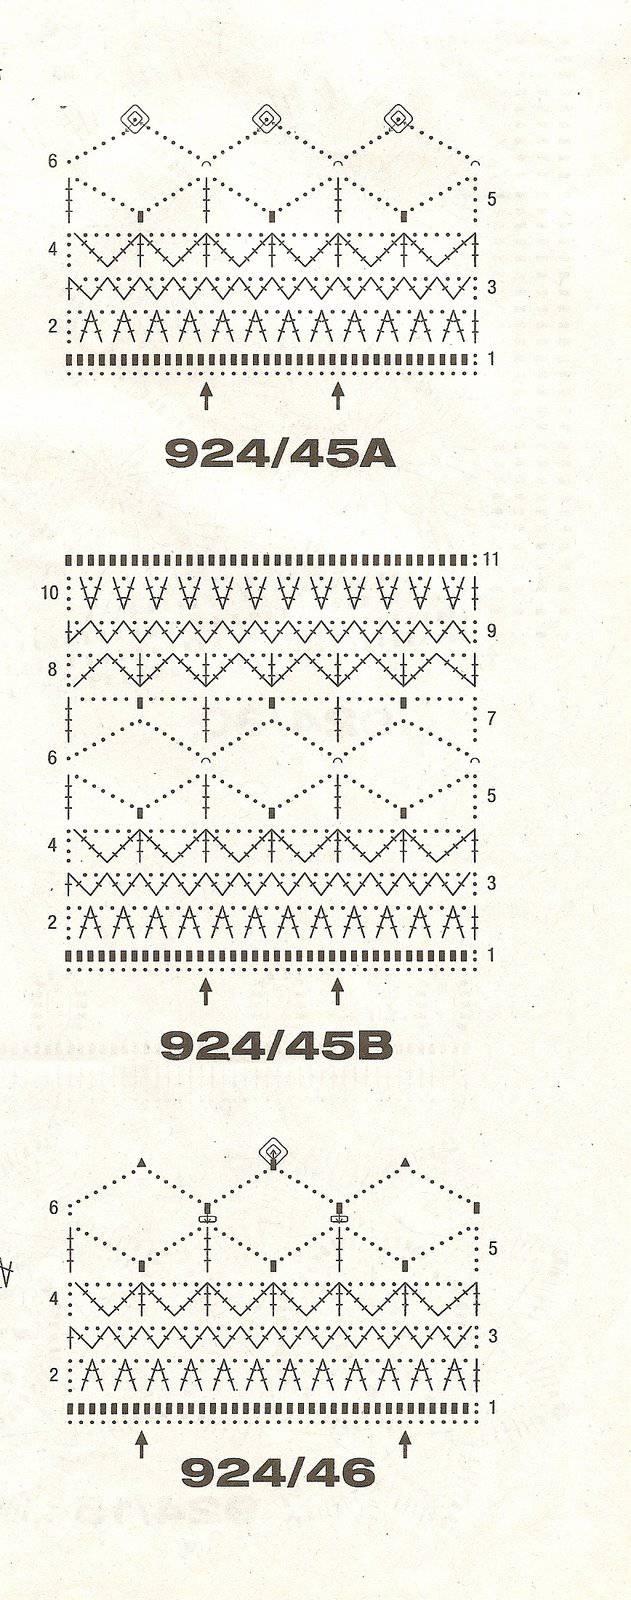 9384406236287928 (2)